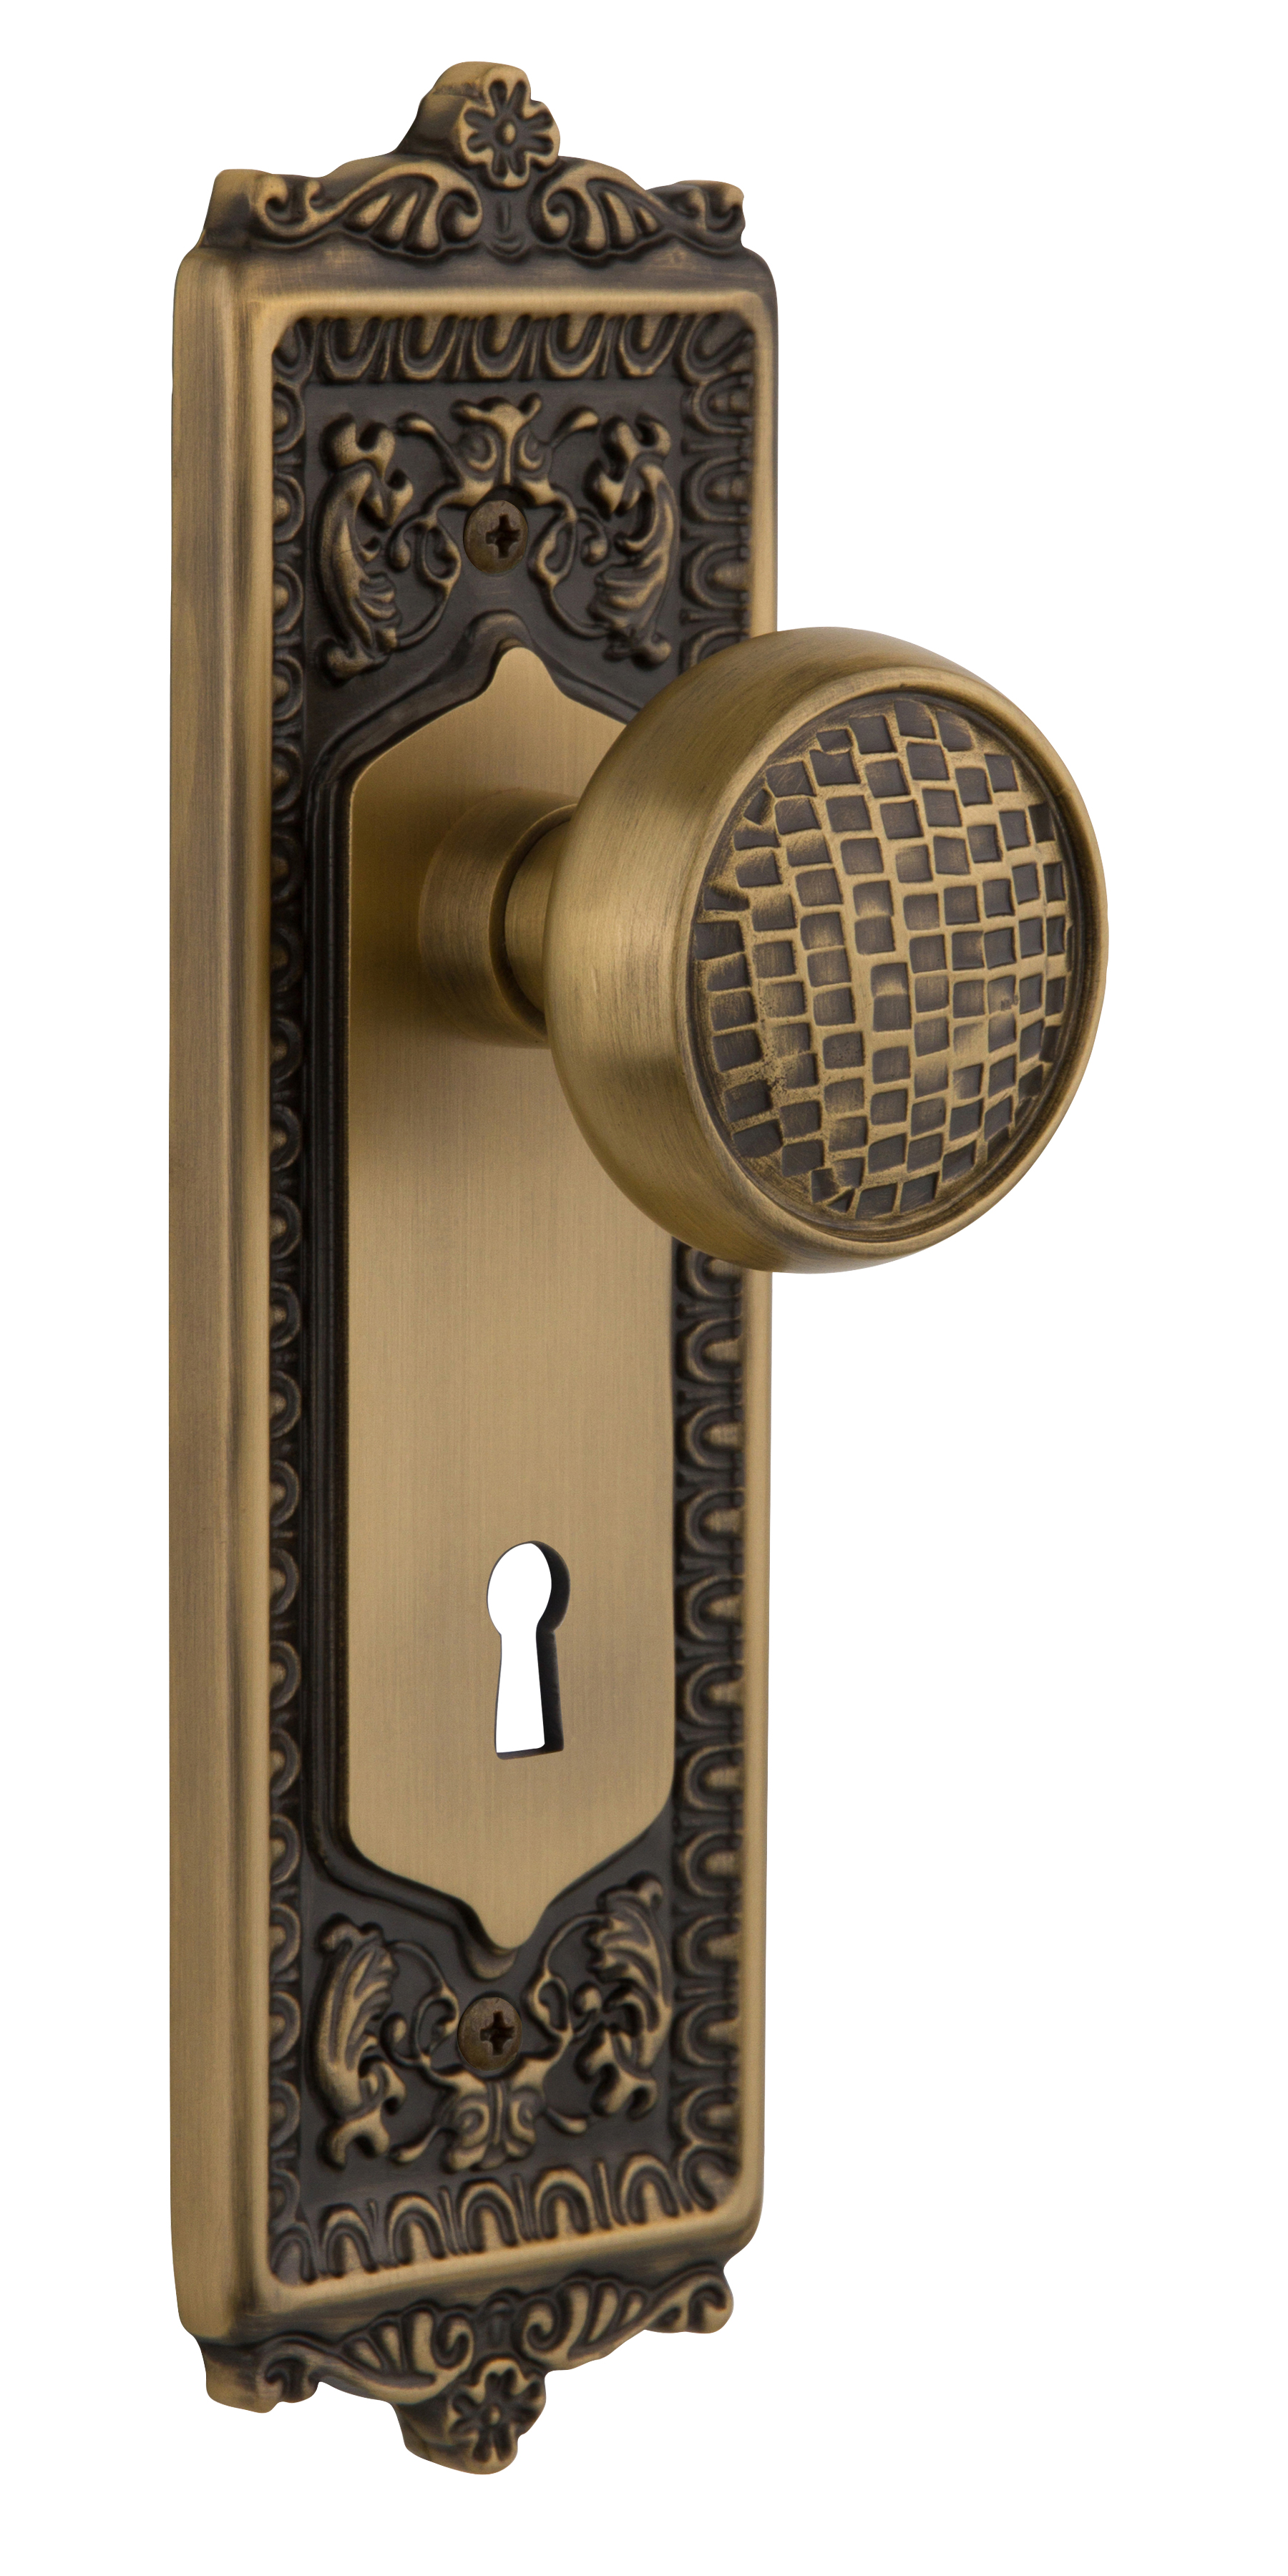 joe antique door large doors keys pinterest locks lock with old skeleton key knobs projects swords pin fajen by handles on